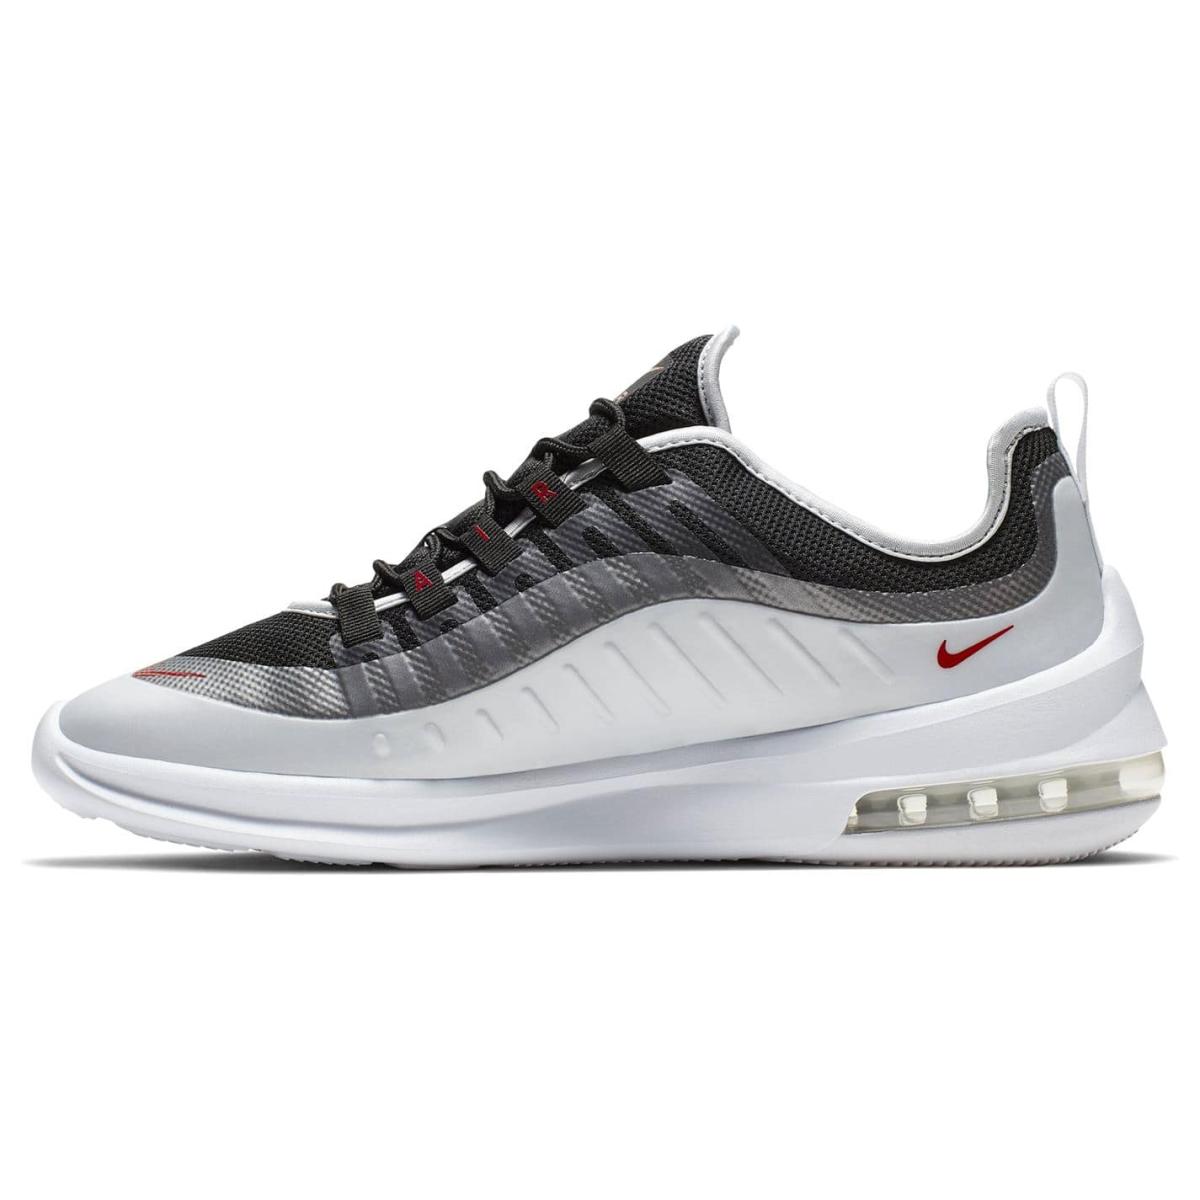 NIKE-Air-Max-Axis-Scarpe-da-ginnastica-Scarpe-da-Corsa-Uomo-Sneaker-Scarpe-Sportive-Fitness-1313 miniatura 20